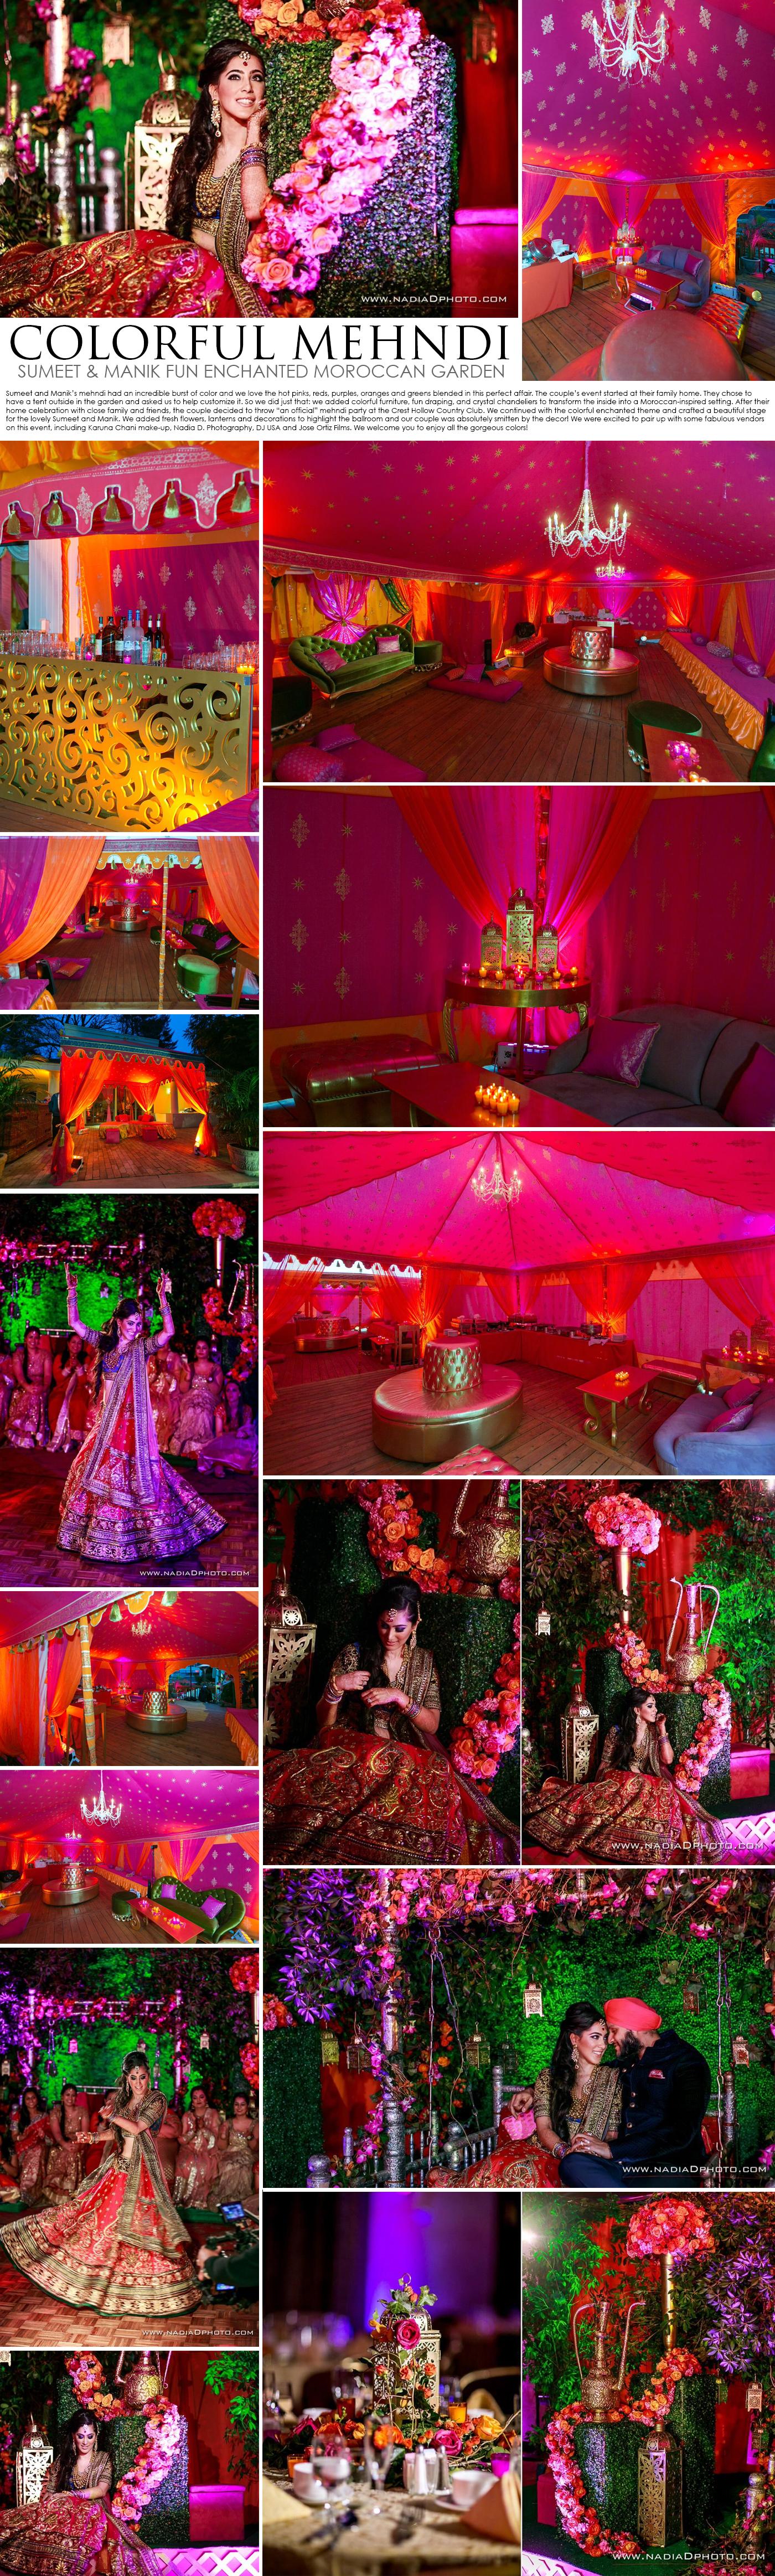 colorful mehndi decor